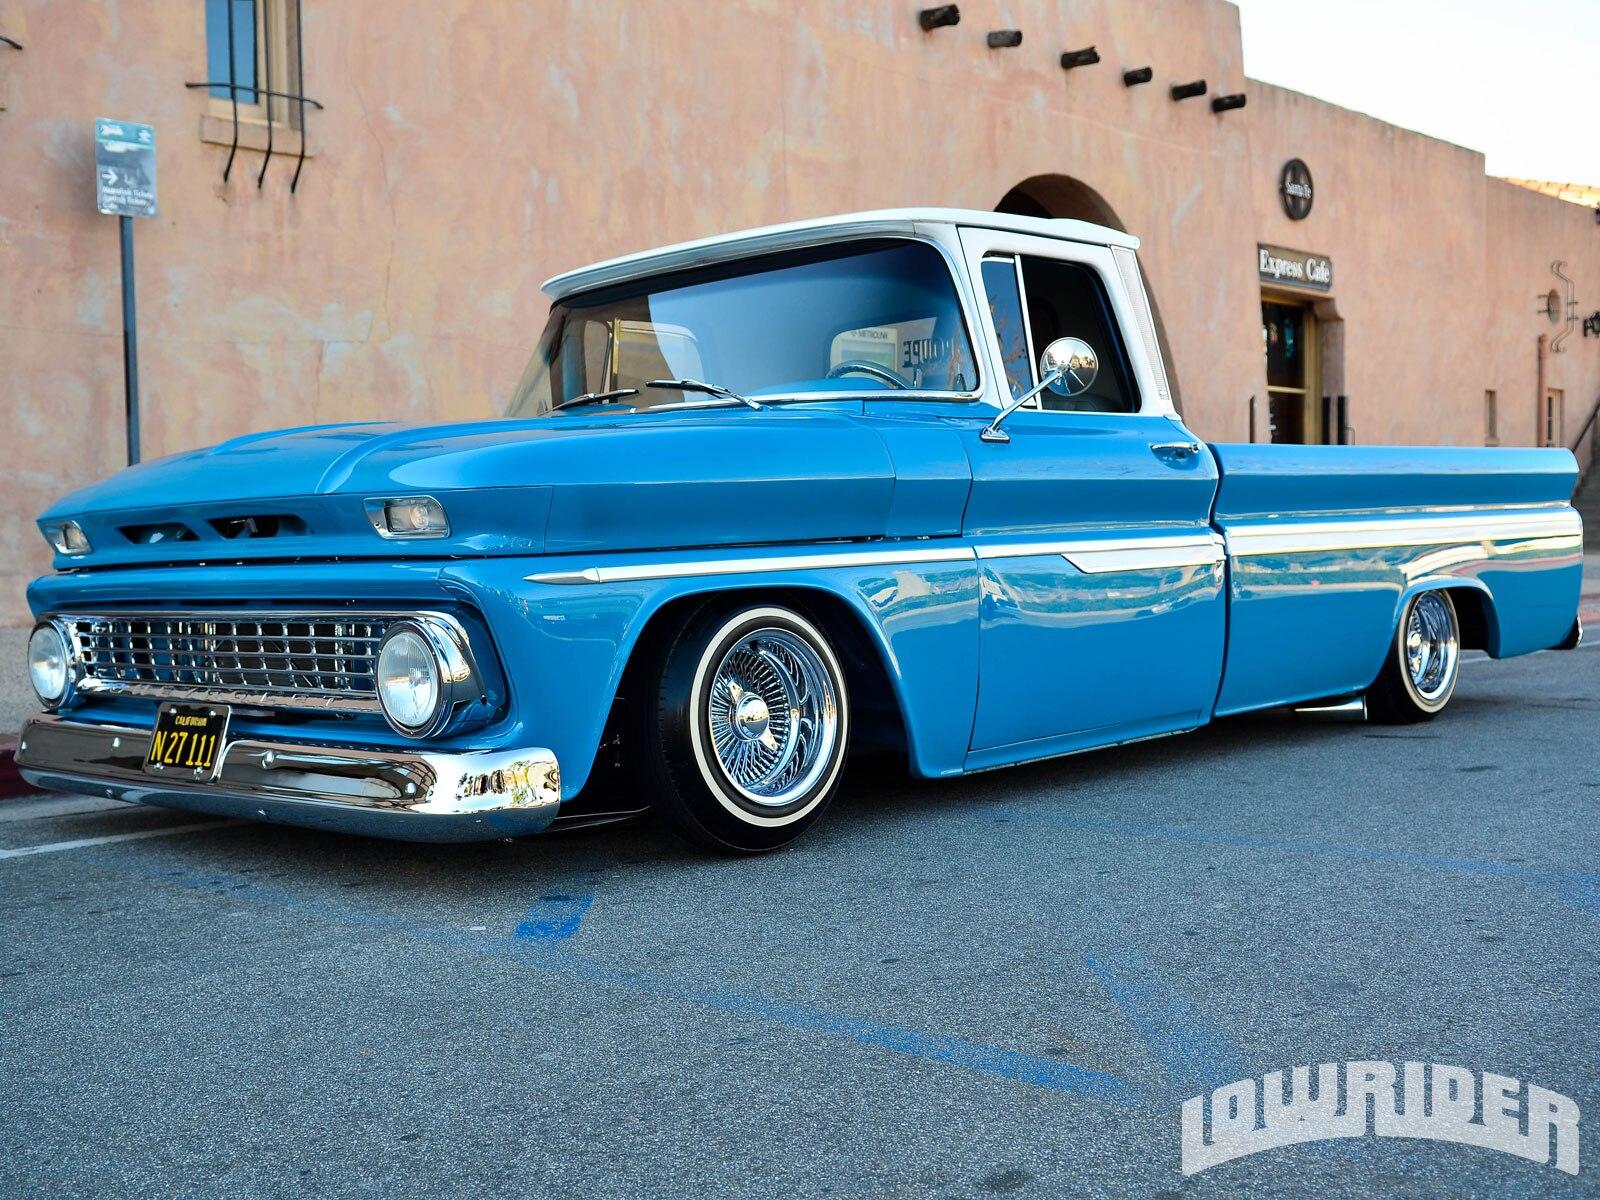 1208-lrmp-01-o-1963-chevrolet-truck-pickup1